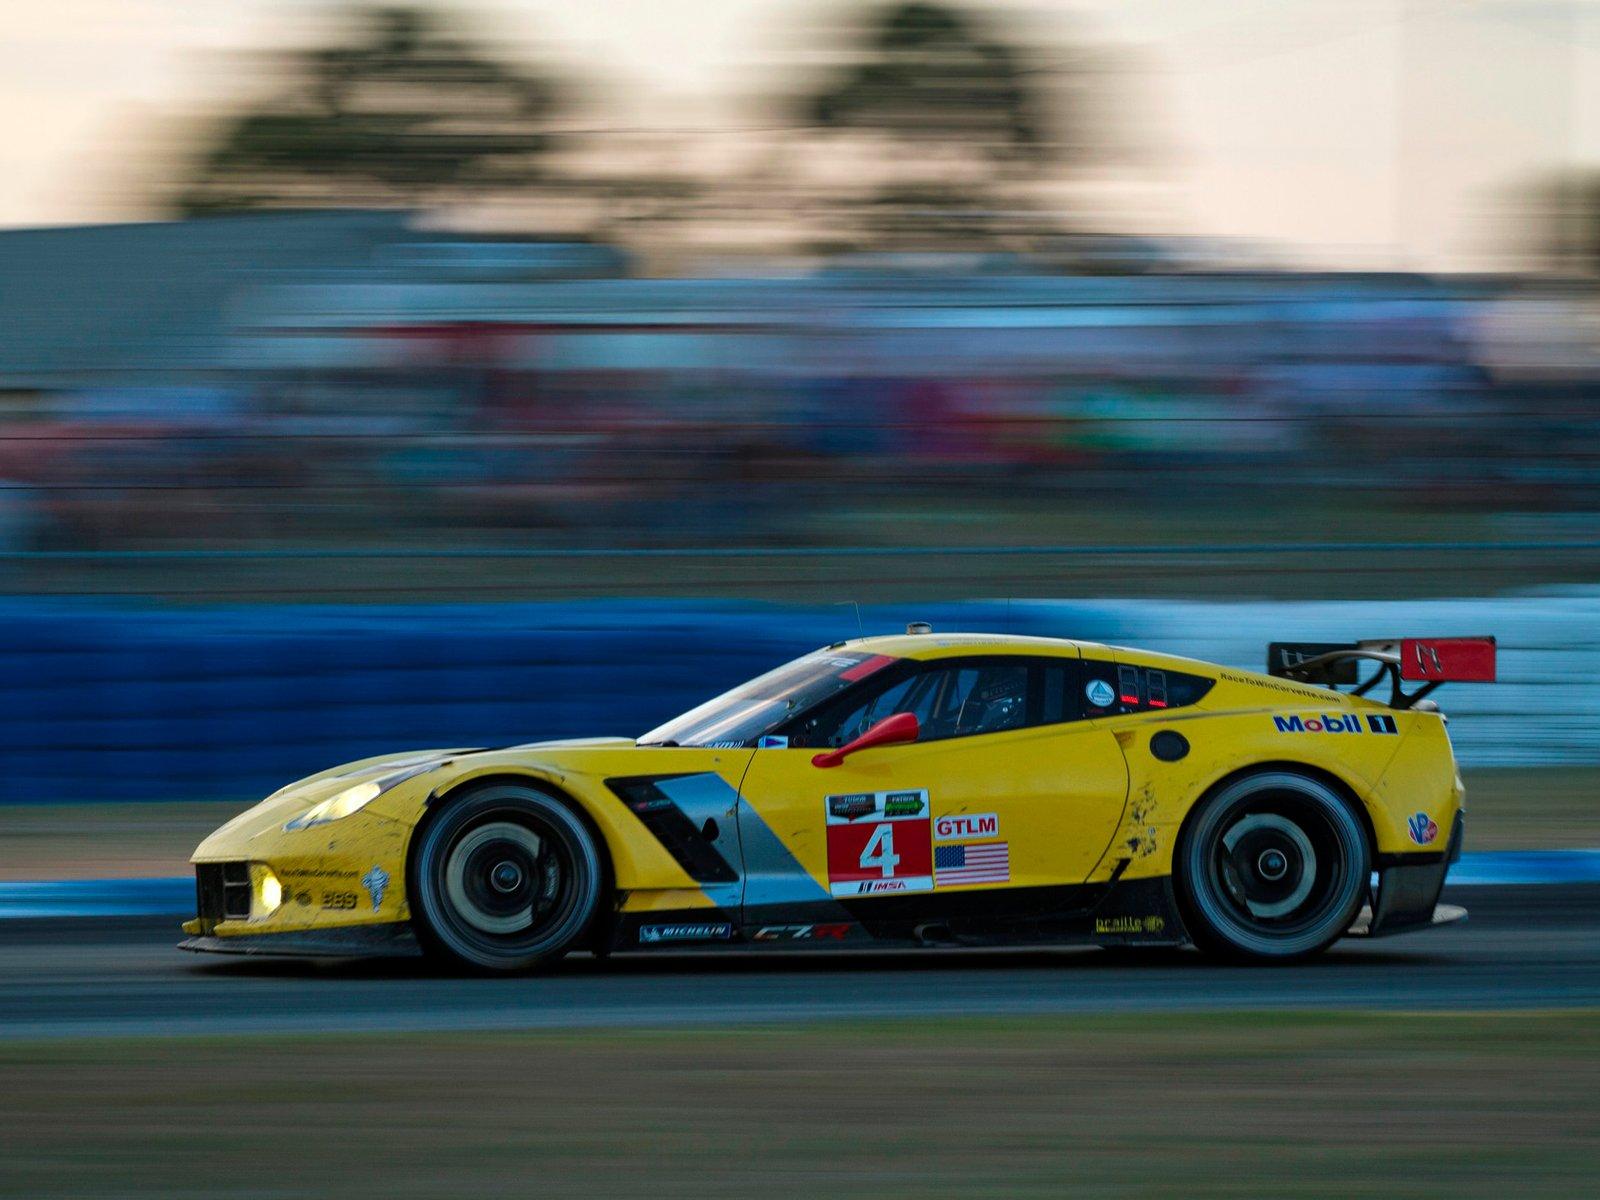 Corvette C7R GT2 DA 7 race racing supercar h wallpaper background 1600x1200